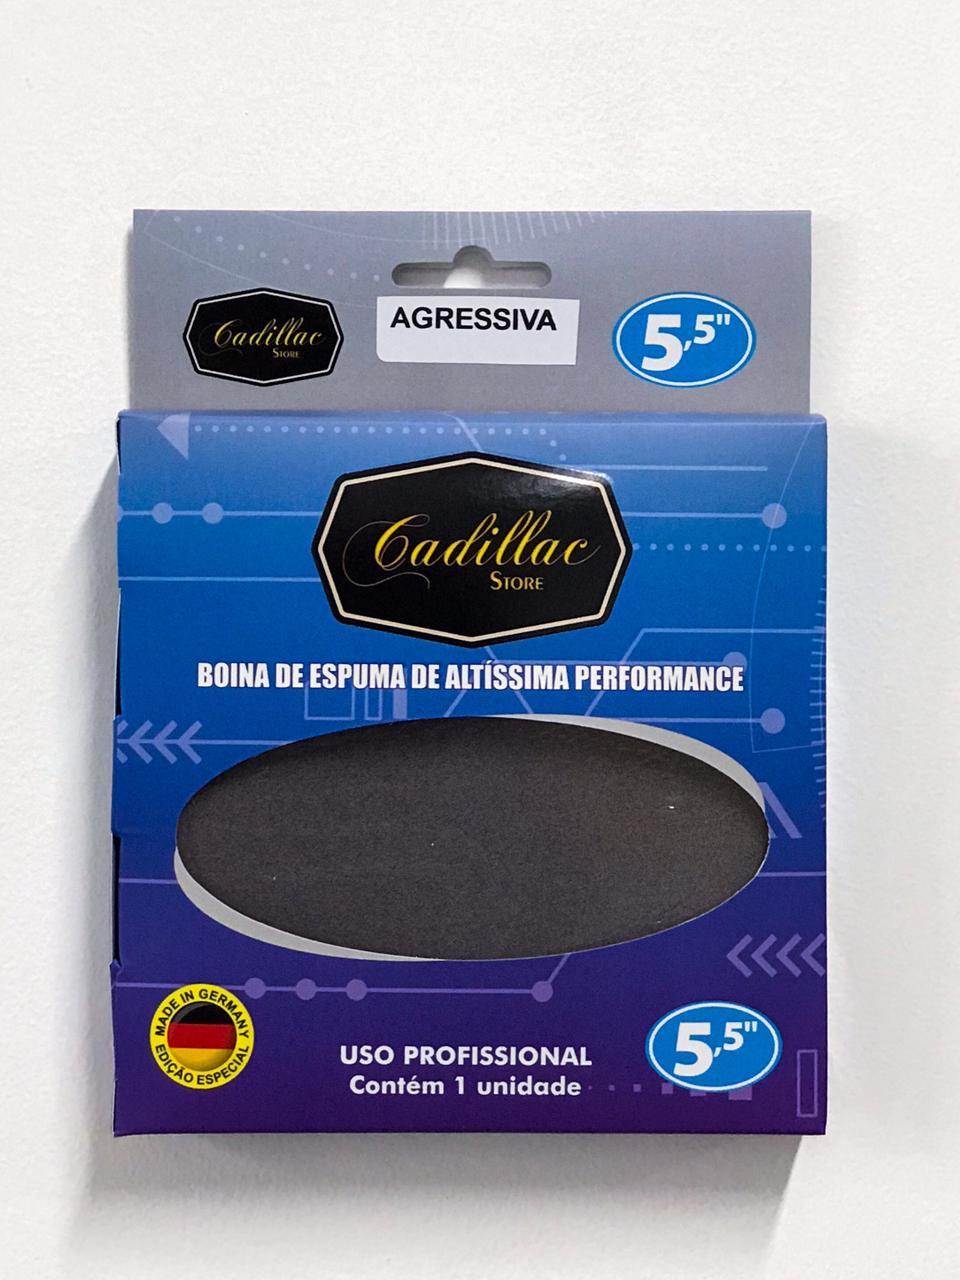 "Boina de Espuma de Altíssima Performance 5,5"" - AGRESSIVA/CORTE - CADILLAC"